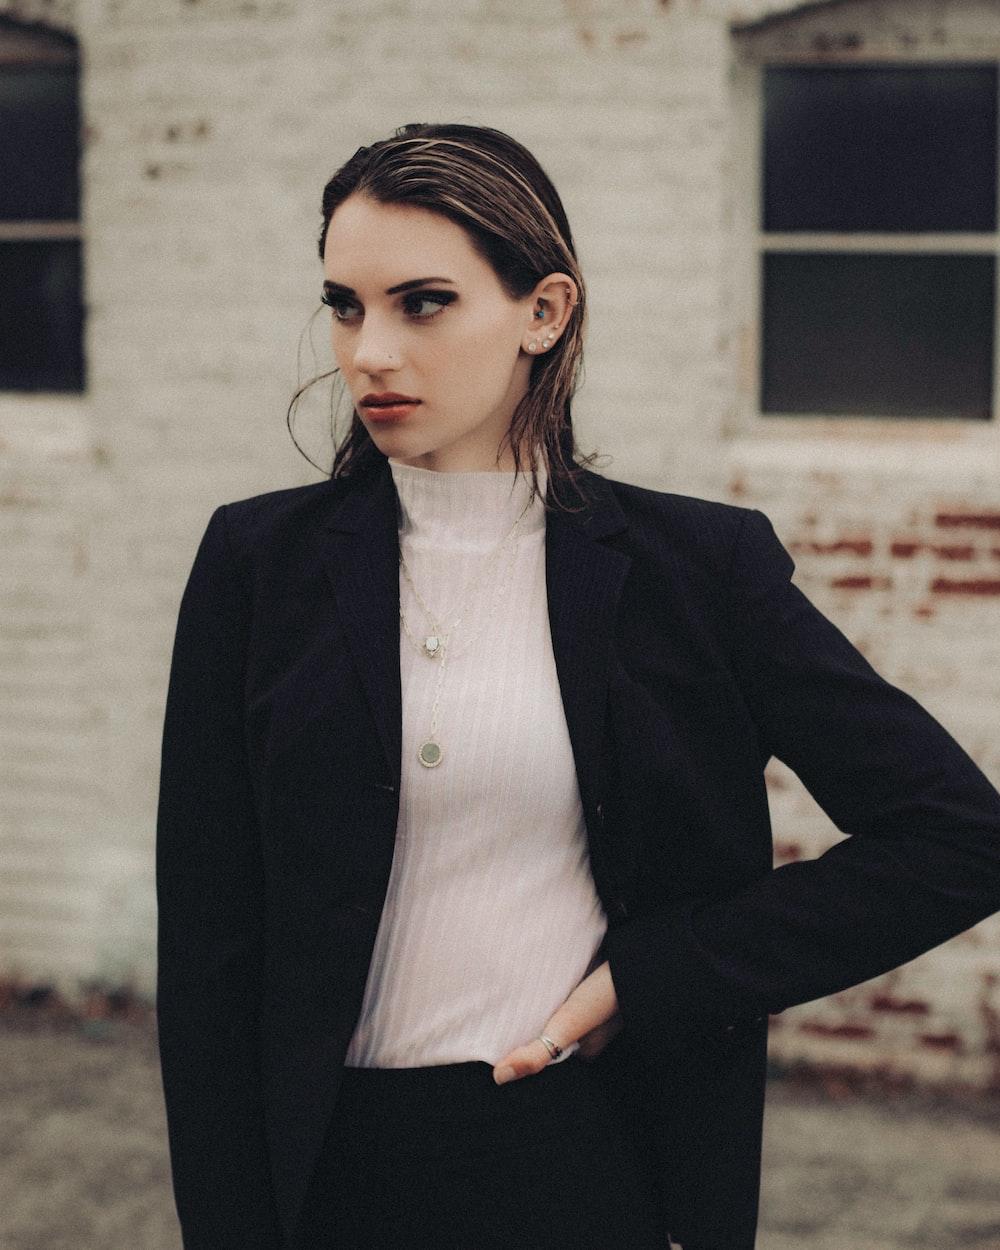 woman in black blazer standing near white wall